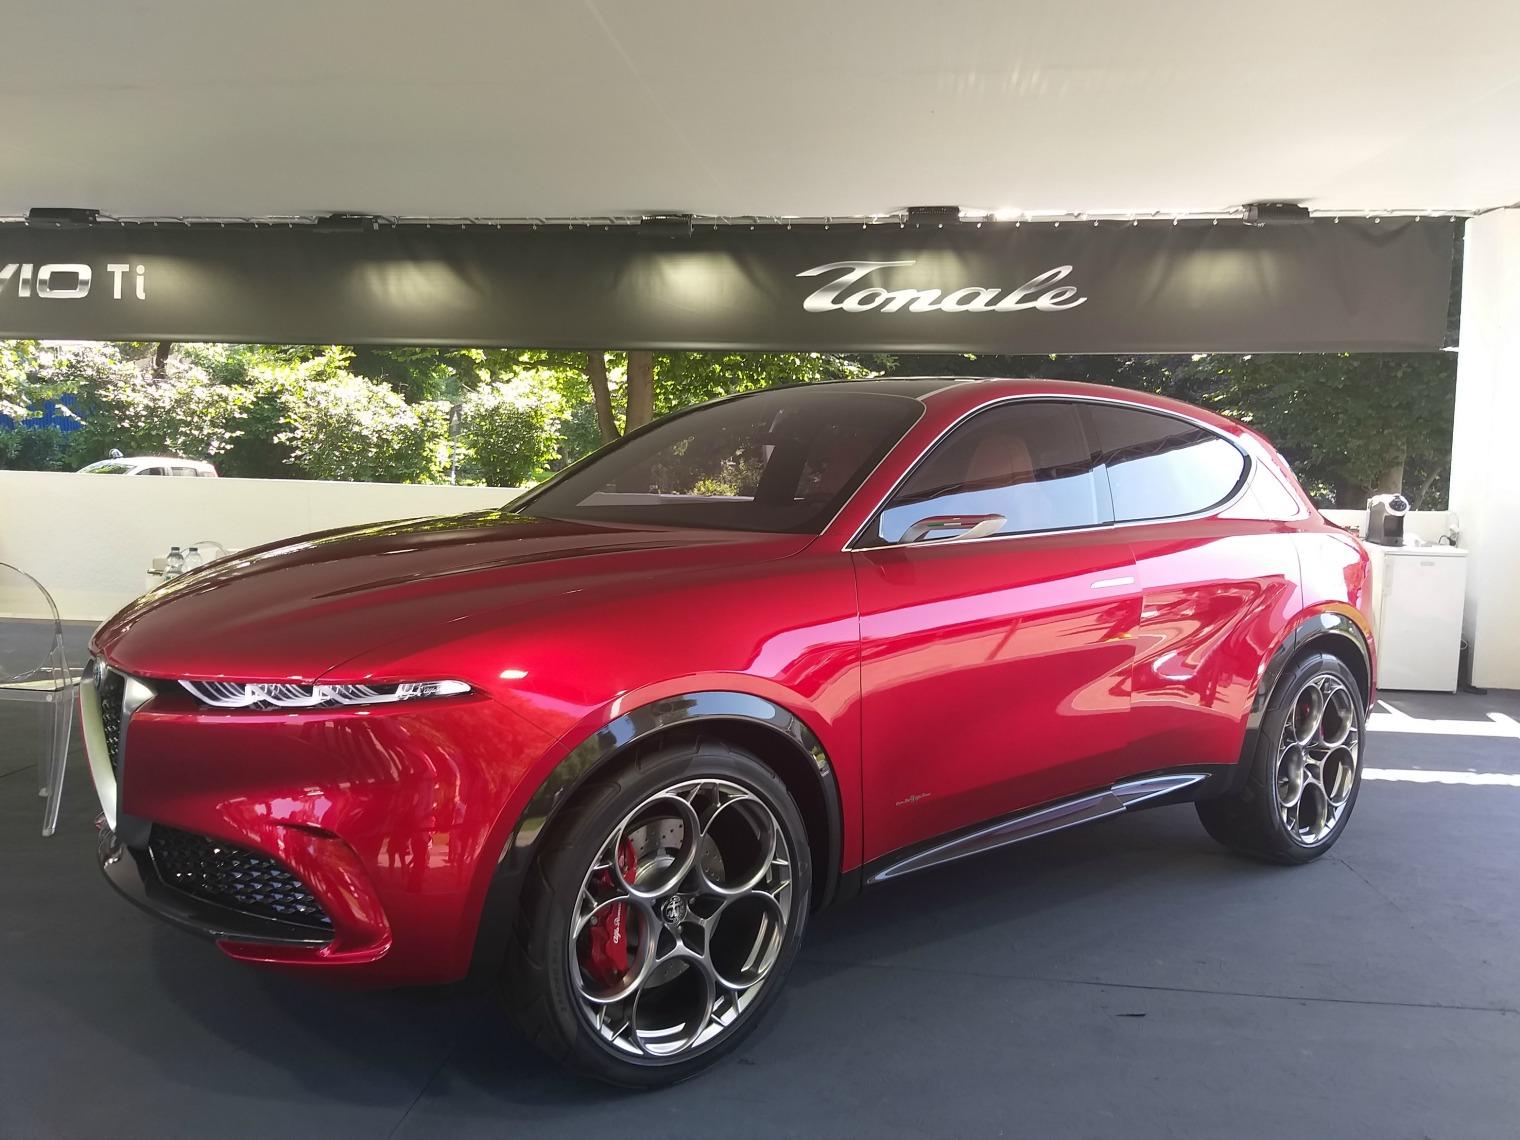 nuova Alfa Romeo Tonale Parco Valentino 2019